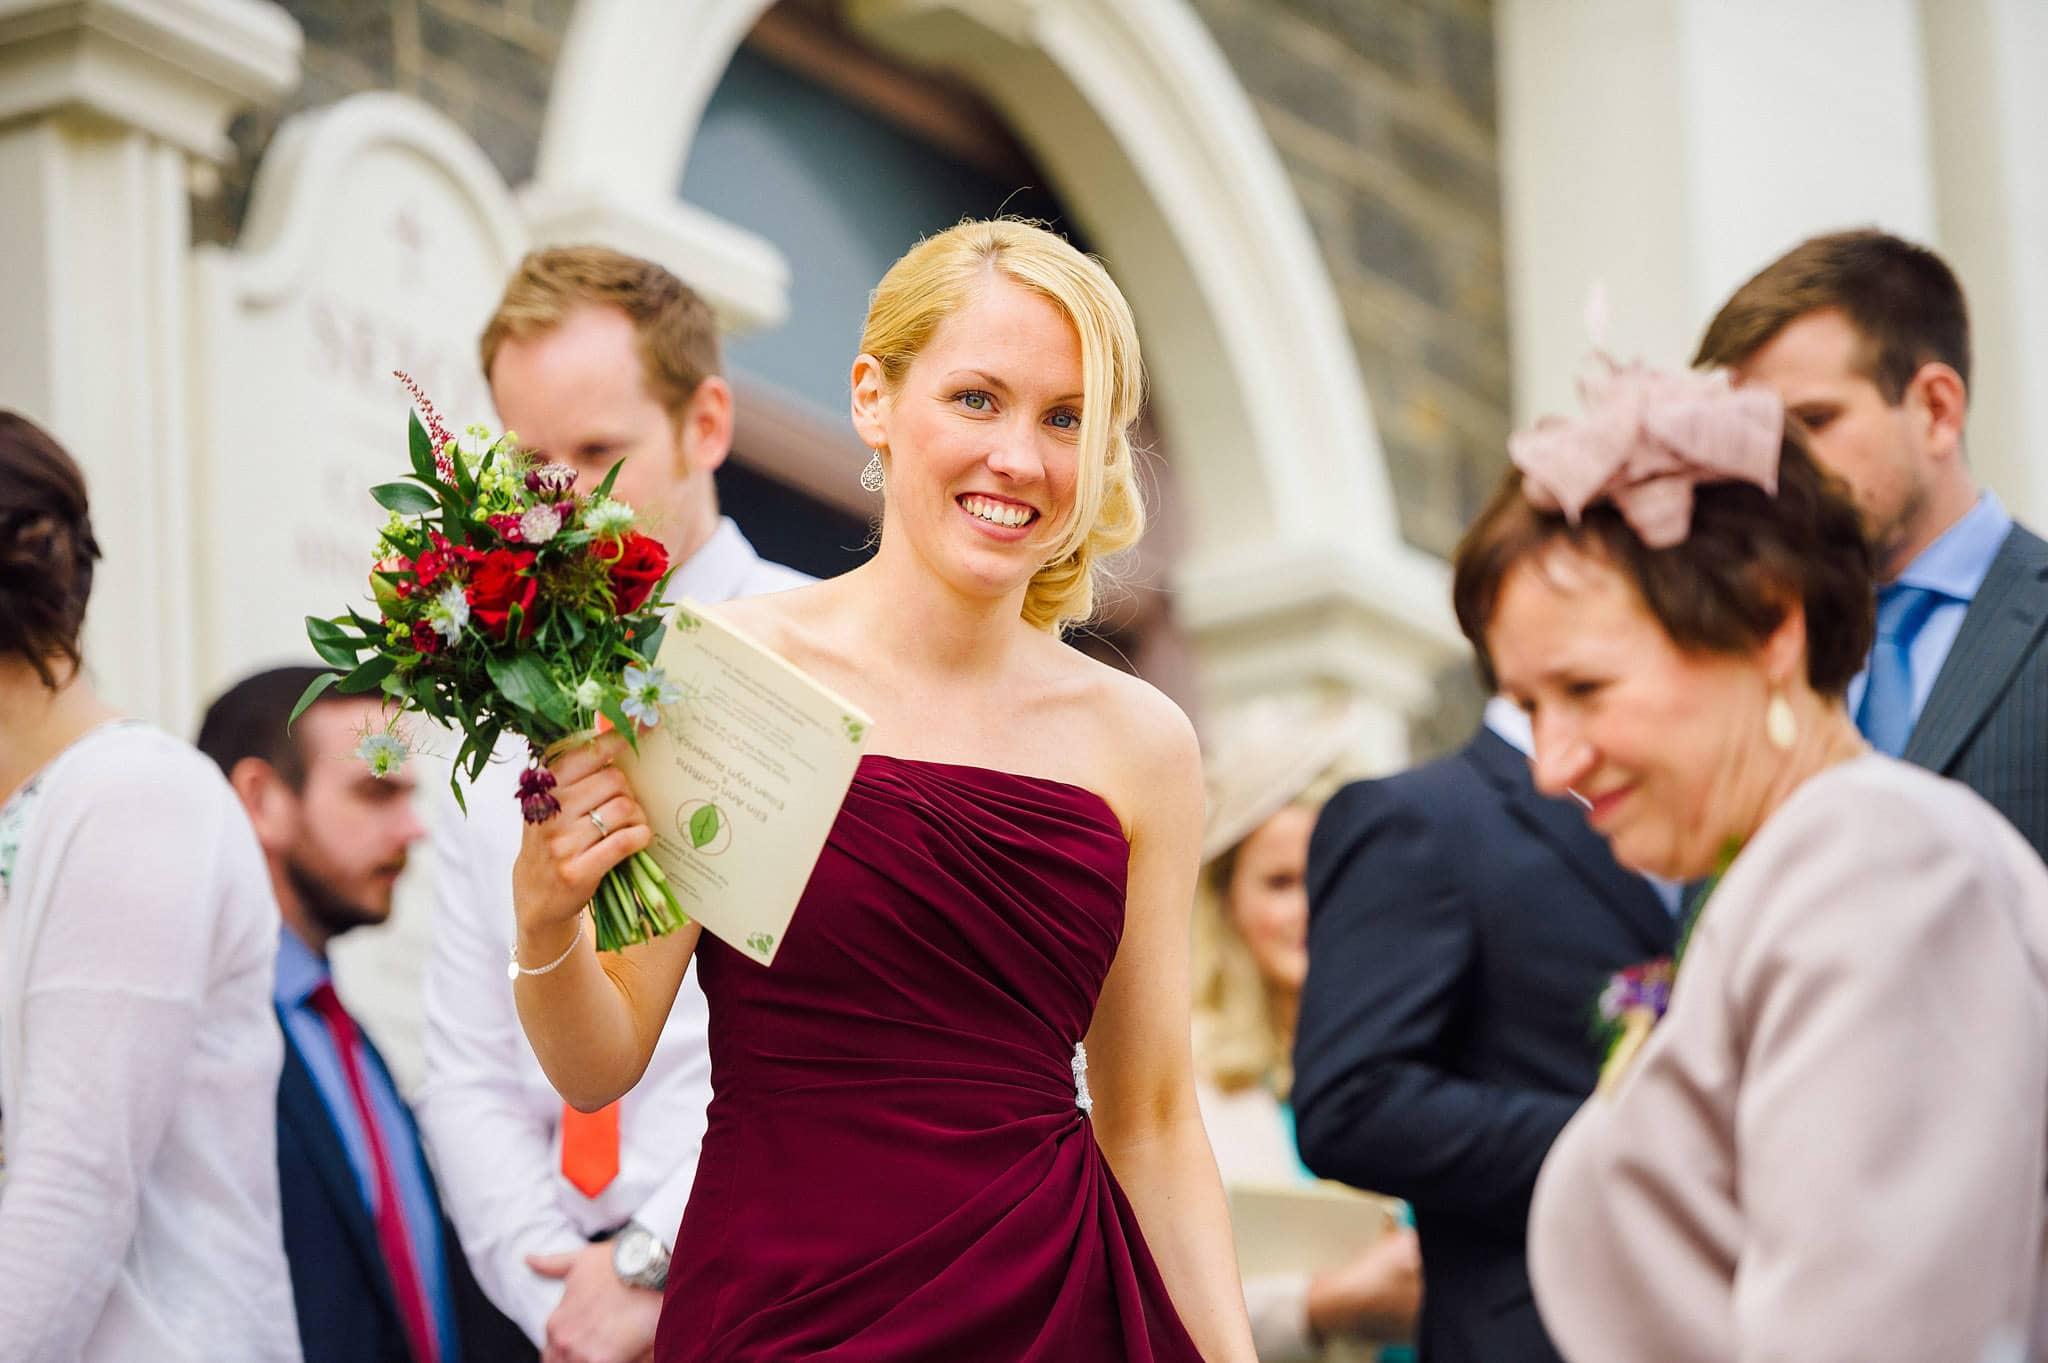 wedding-photographer-aberystwyth-wales (65)